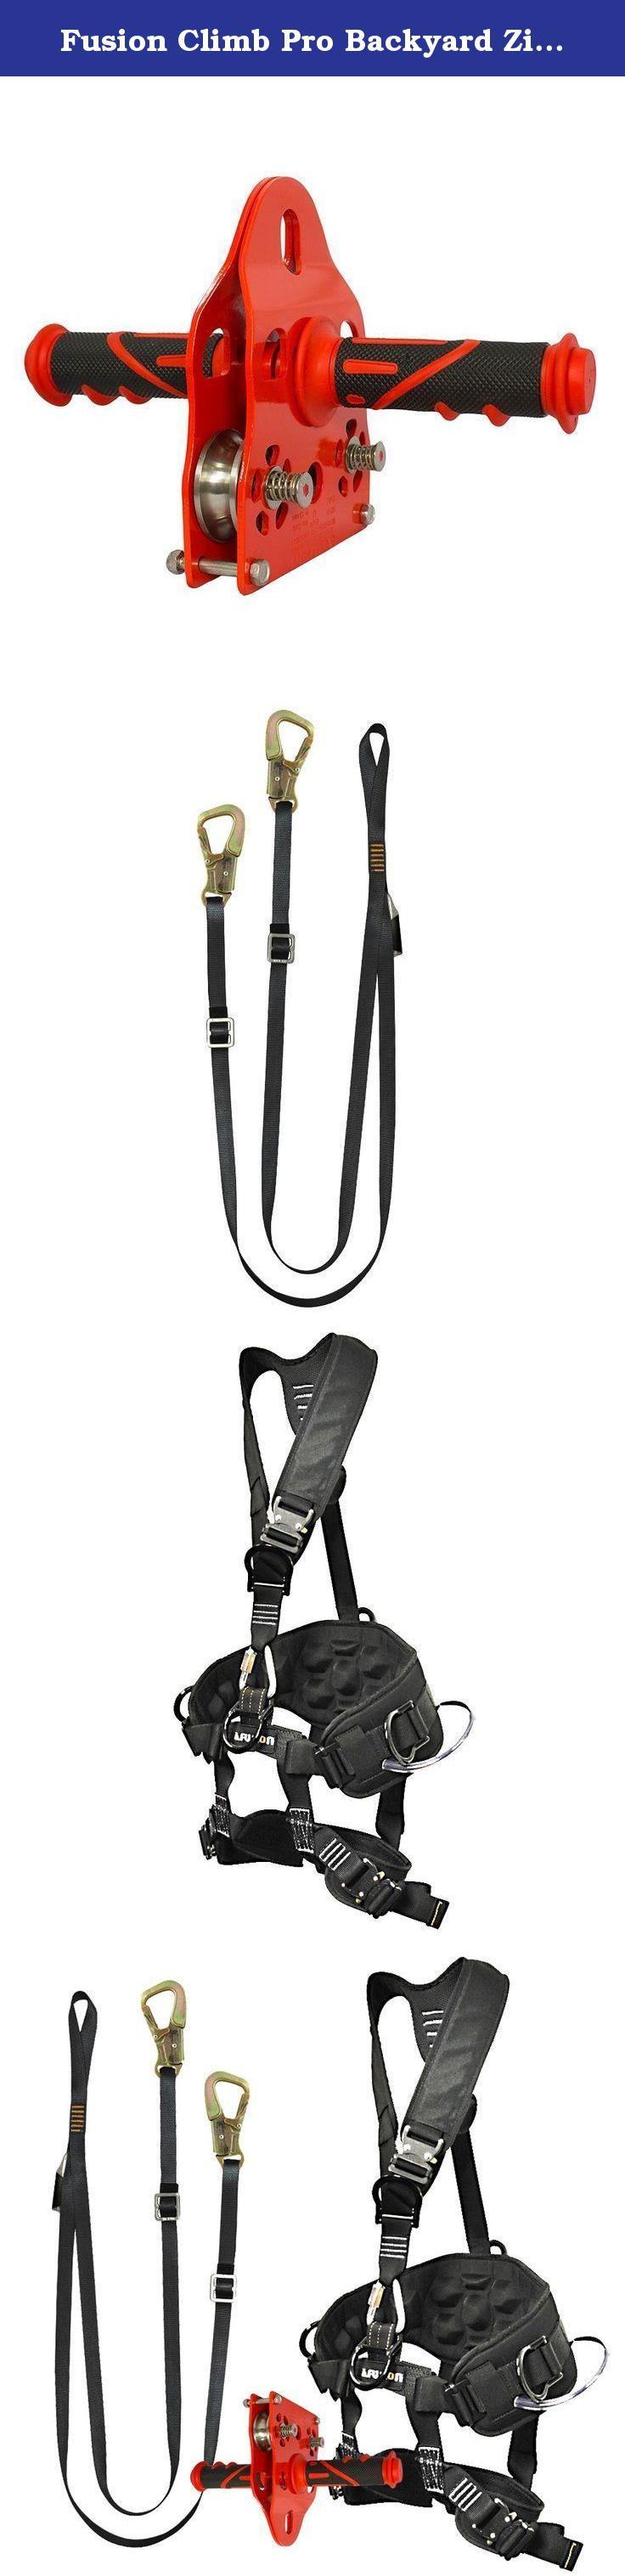 fusion climb pro backyard zip line kit fk a hlt 41 harness lanyard